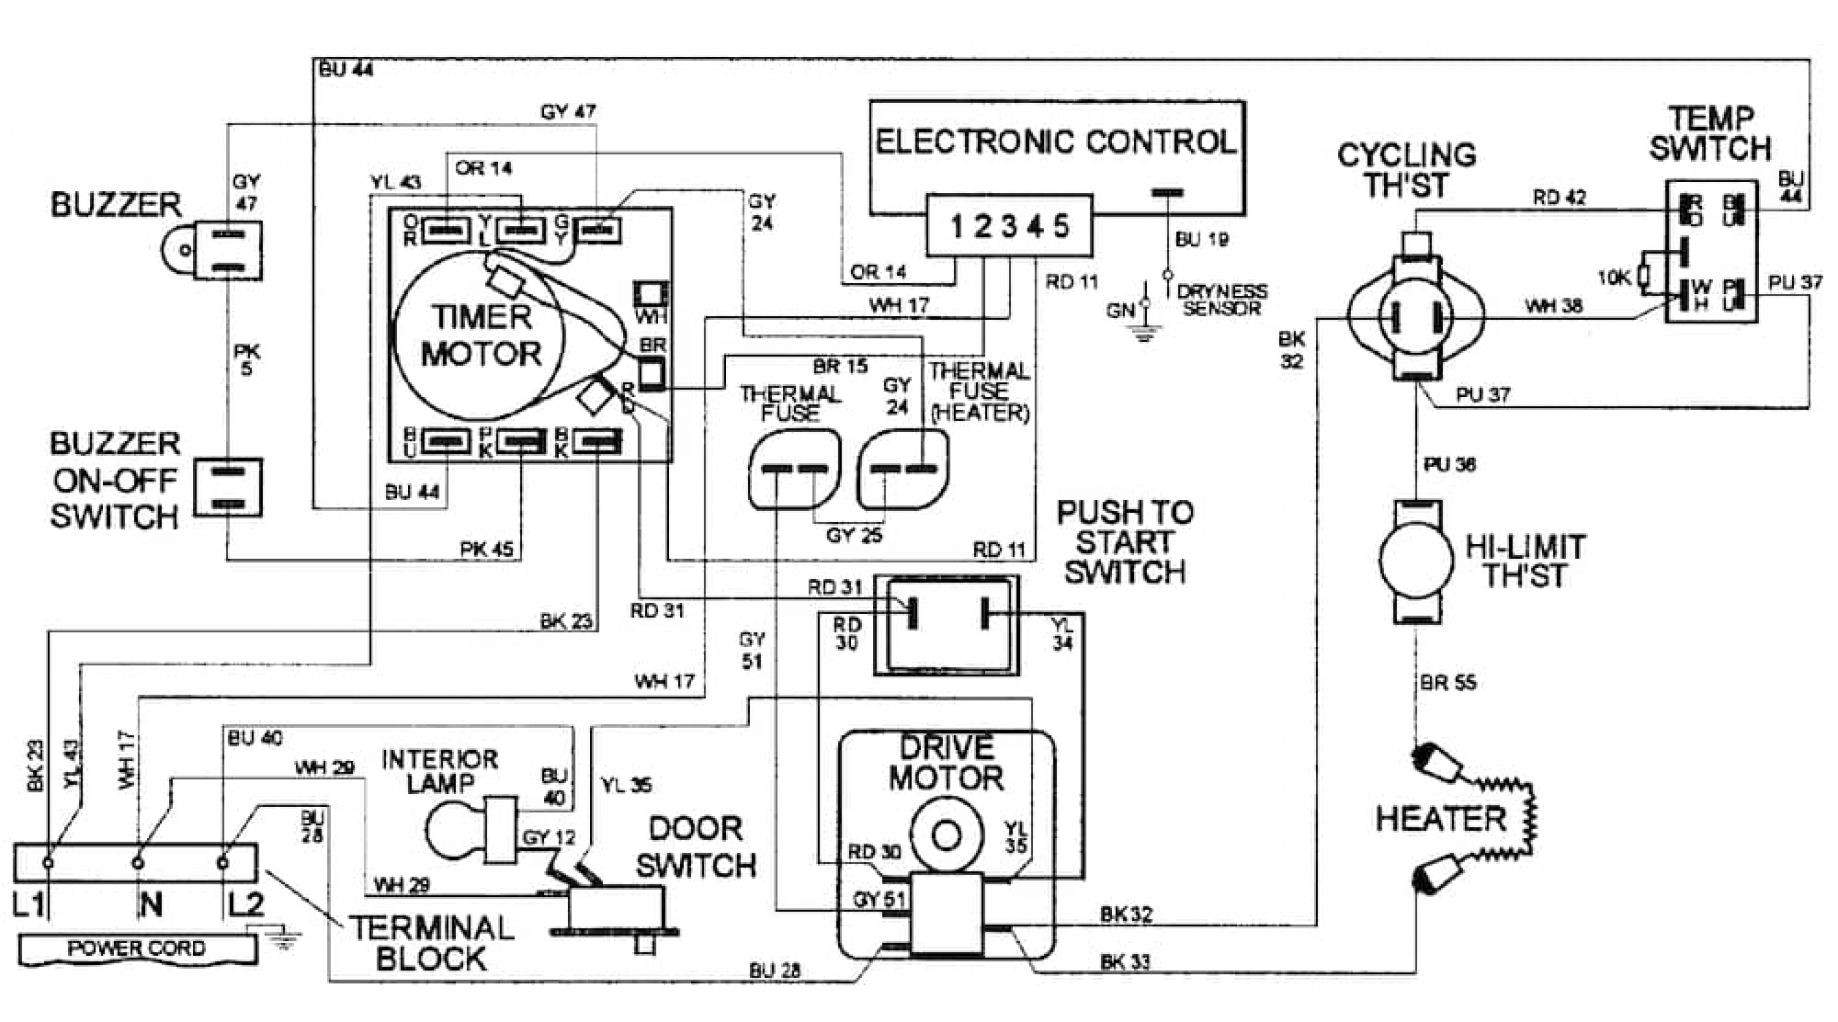 maytag dryer wiring diagram wiring diagram image rh mainetreasurechest com wiring diagram for dryer outlet wiring diagram for dryer outlet